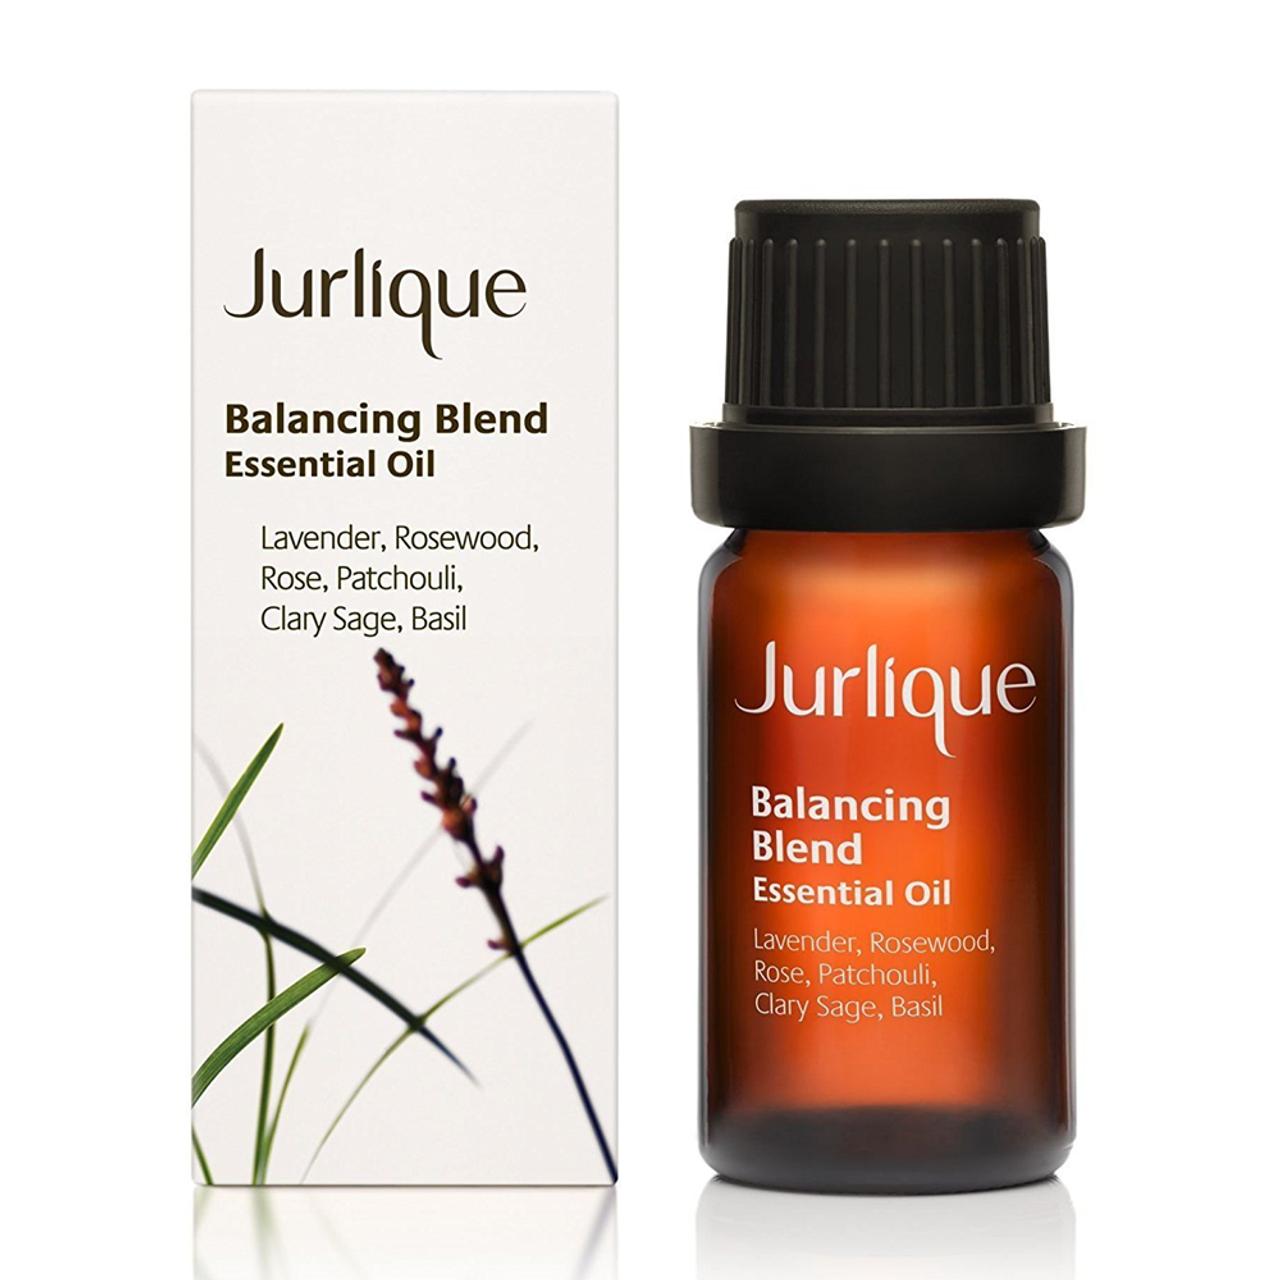 Jurlique Balancing Blend Essential Oil ( discontinued) BeautifiedYou.com